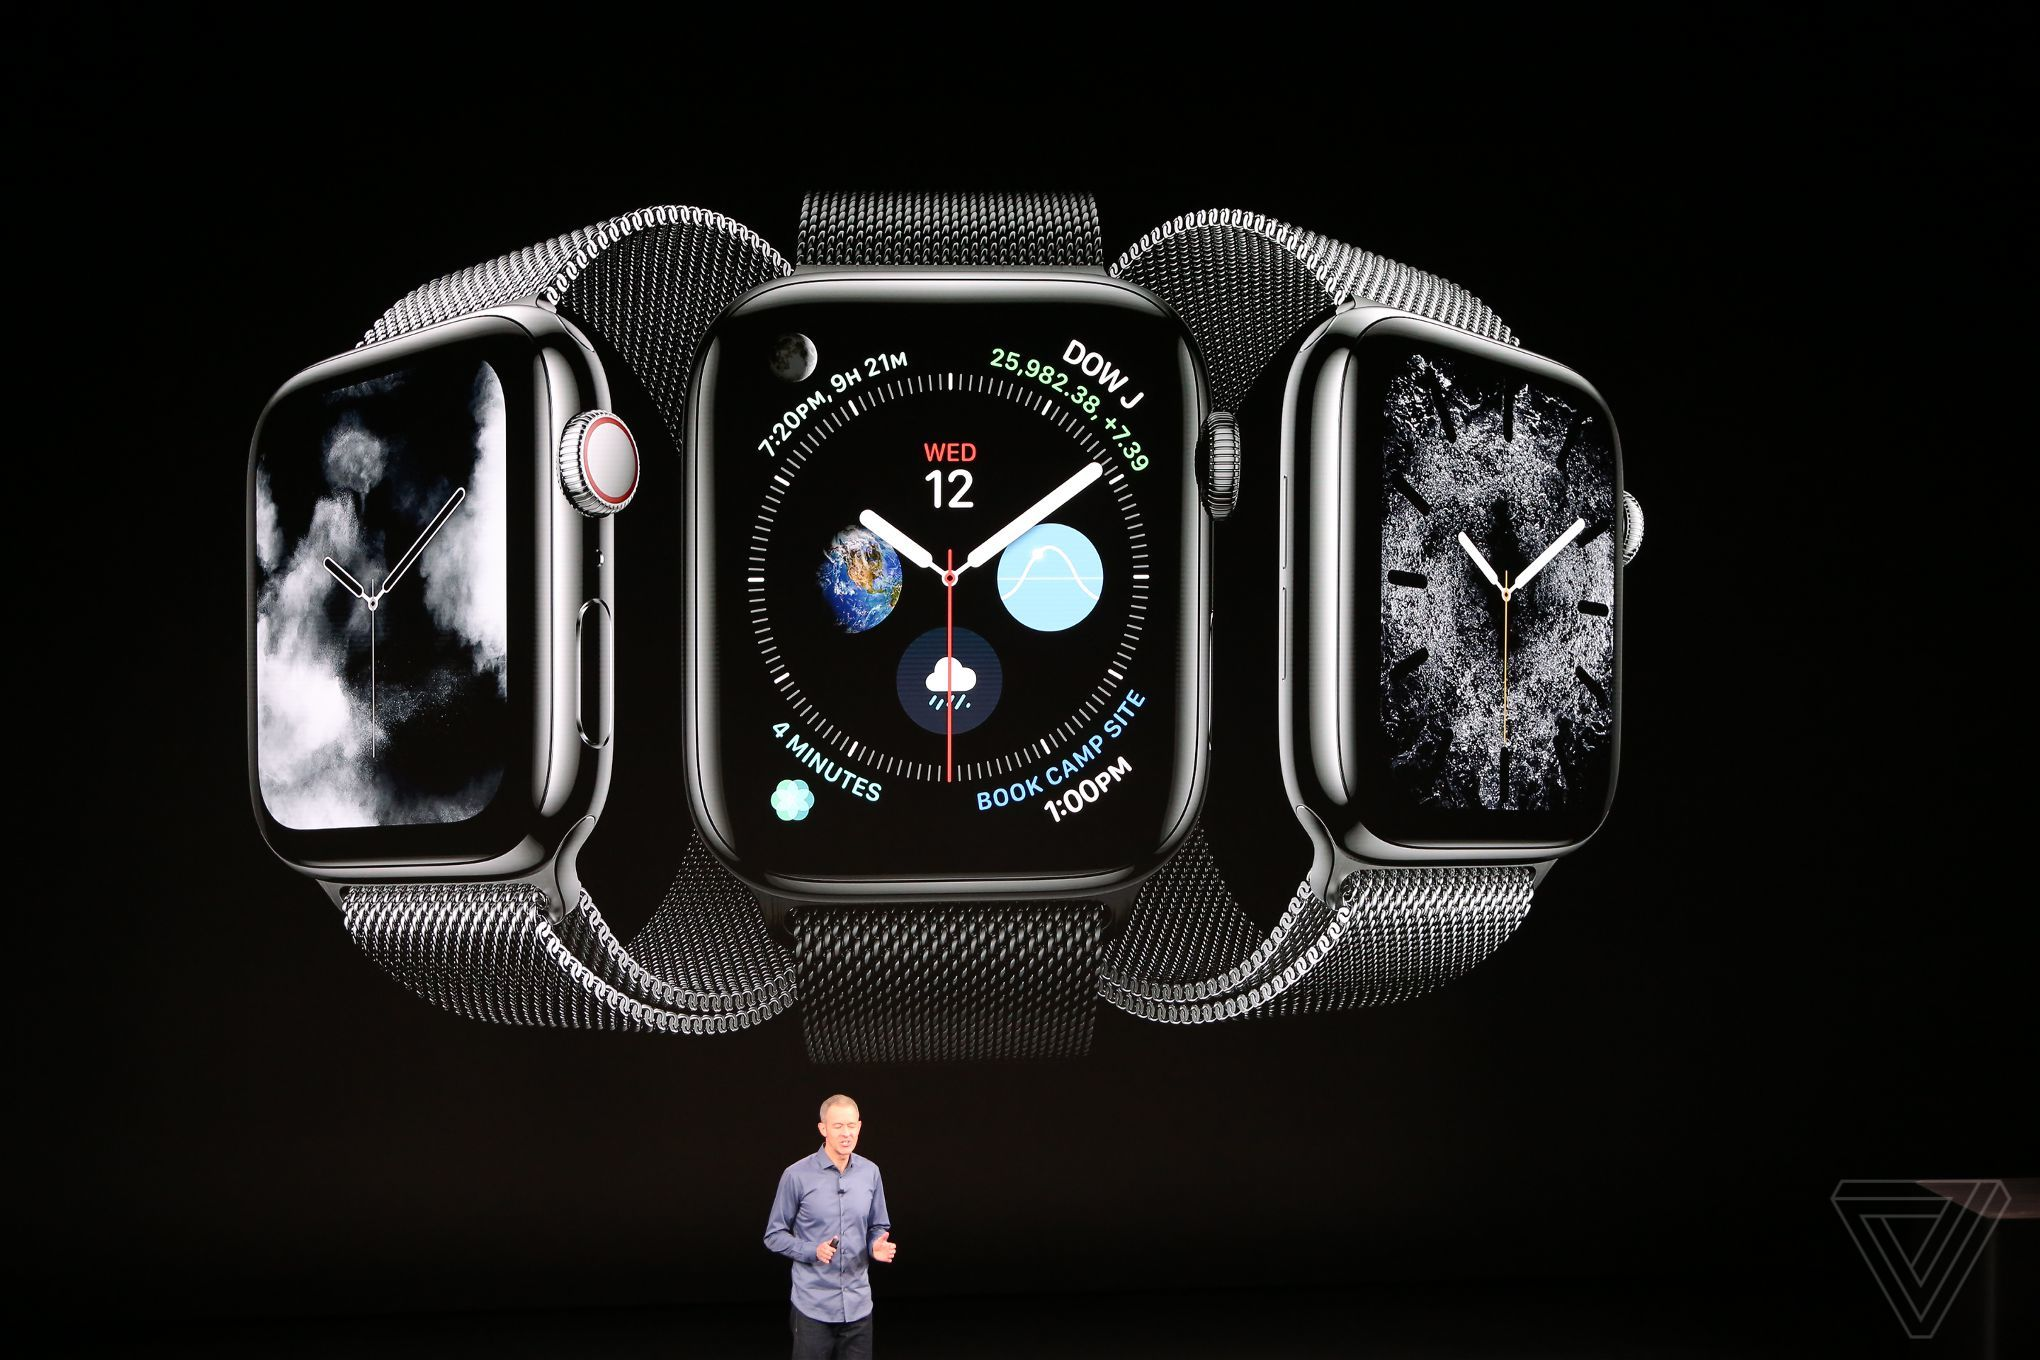 996e259ec أخر كلام | أبل تكشف رسميًا عن ساعتها الذكية الجديدة Apple Watch Series 4